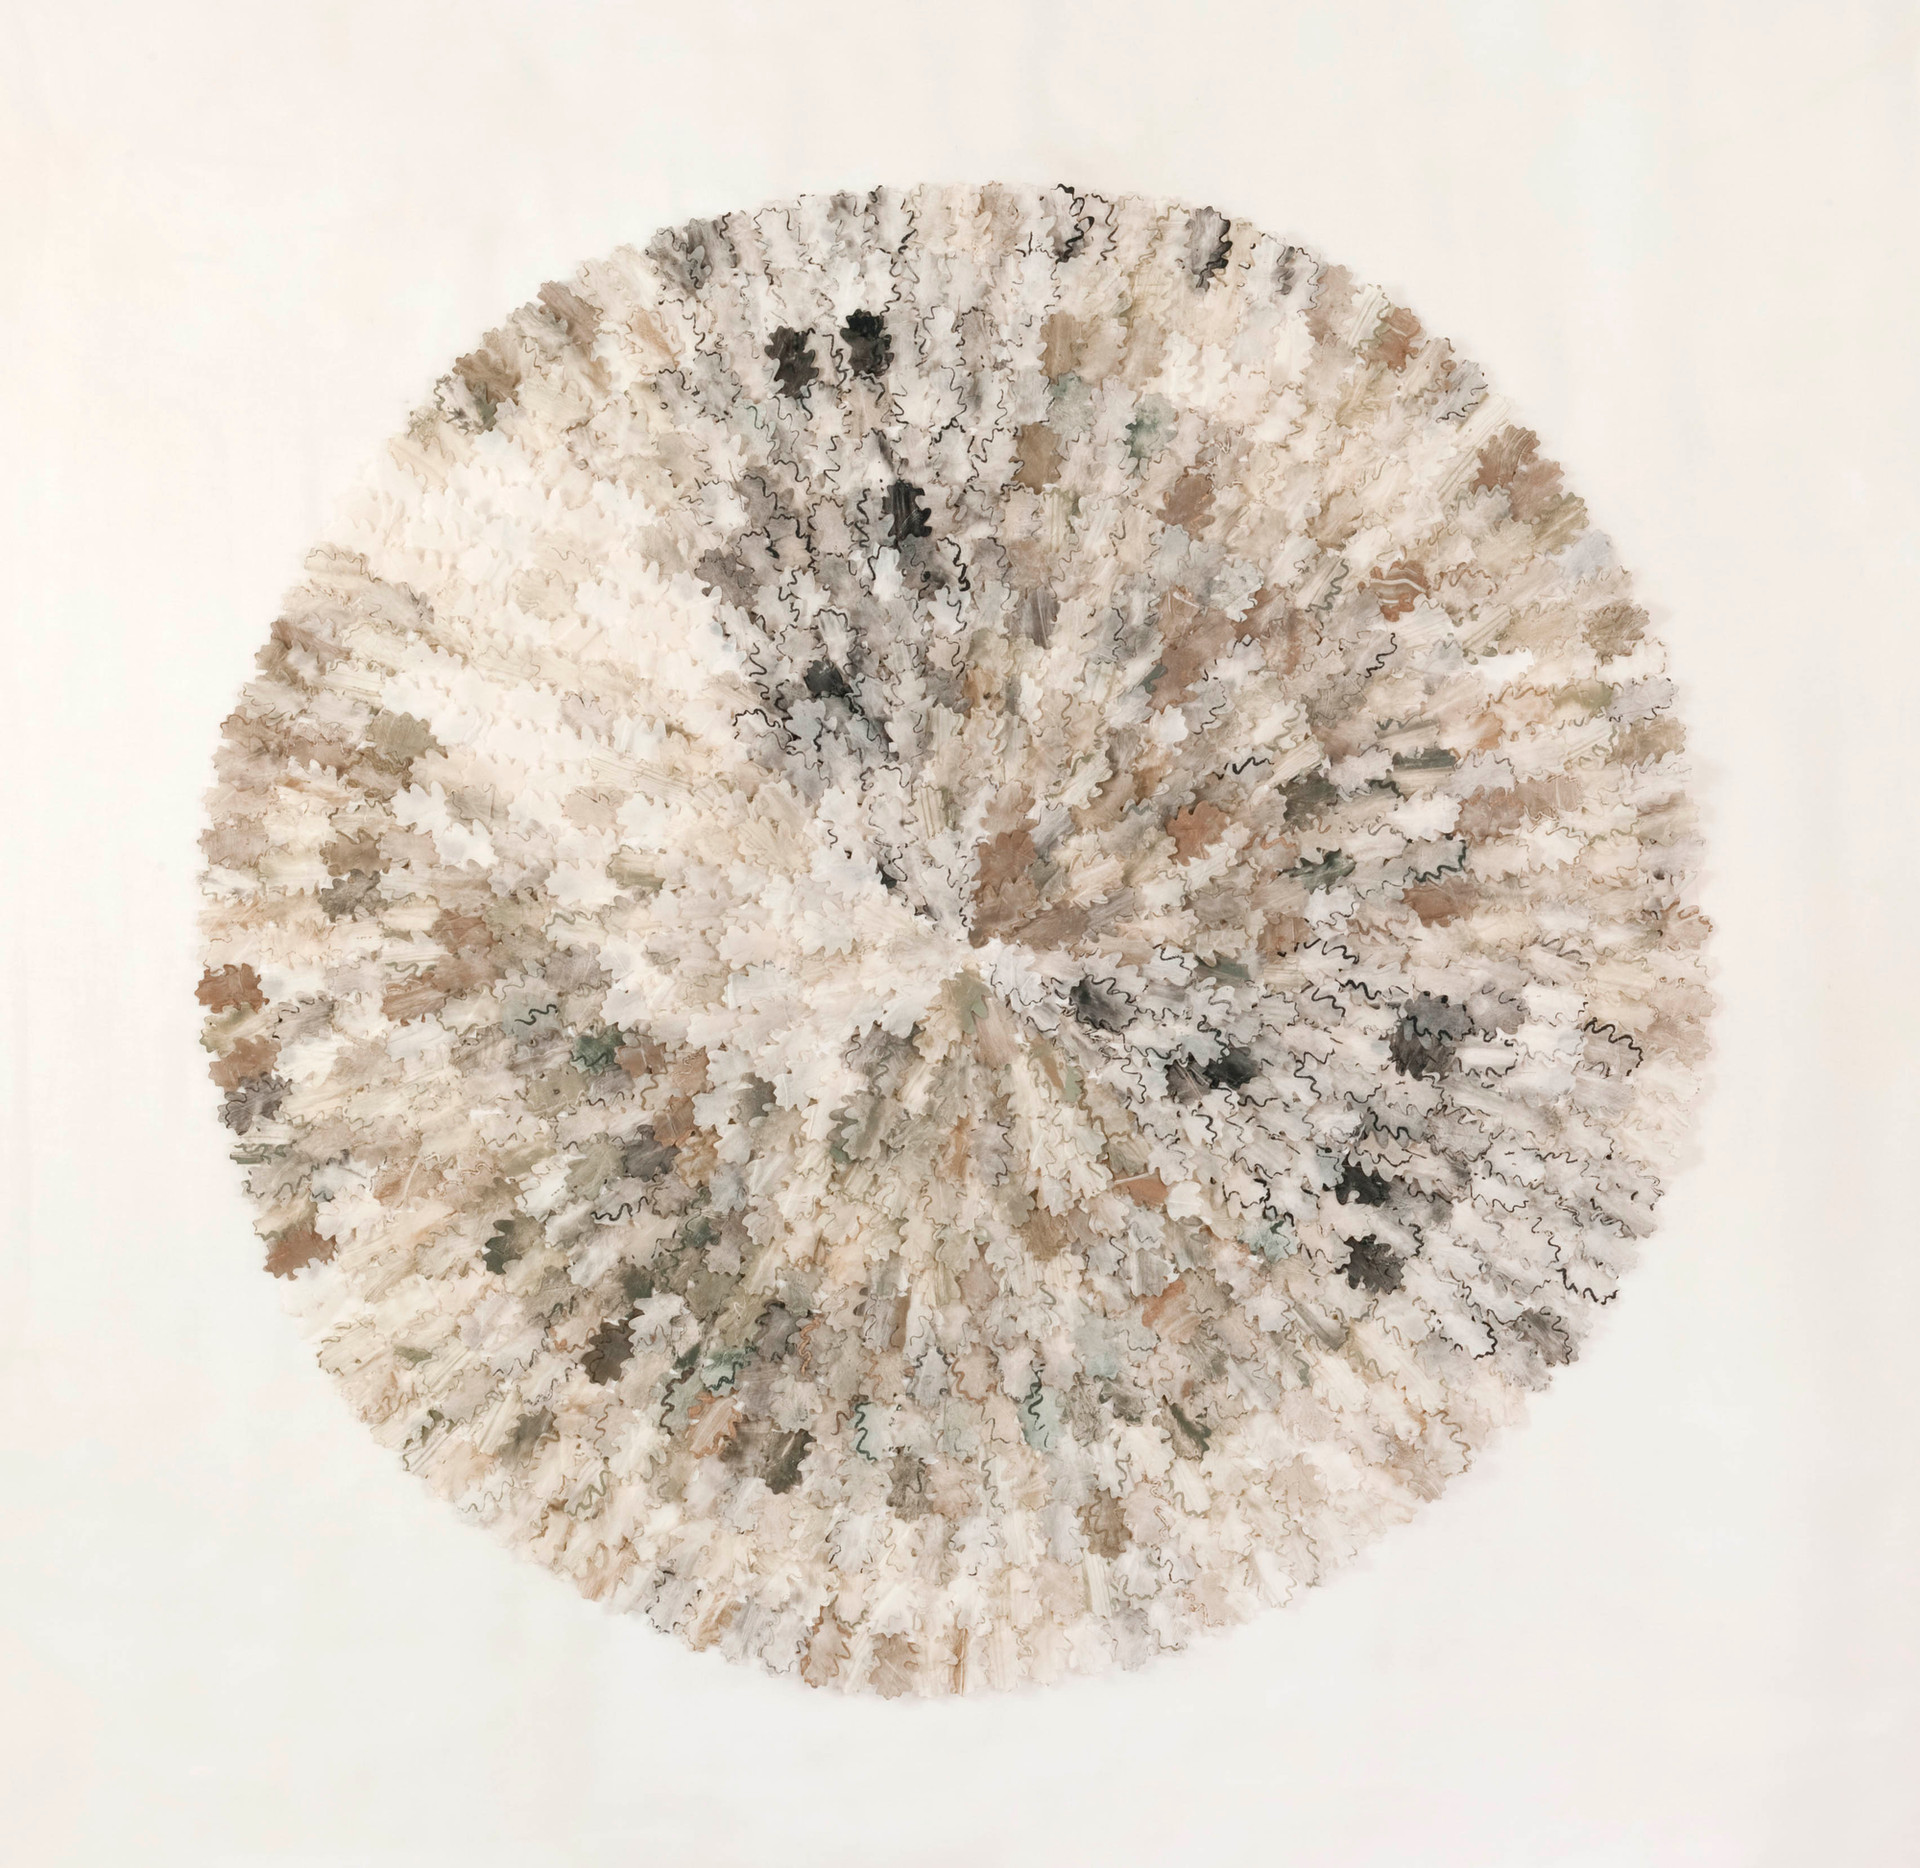 Winter oak/2012/Silk Paper Etching/122x122 cm